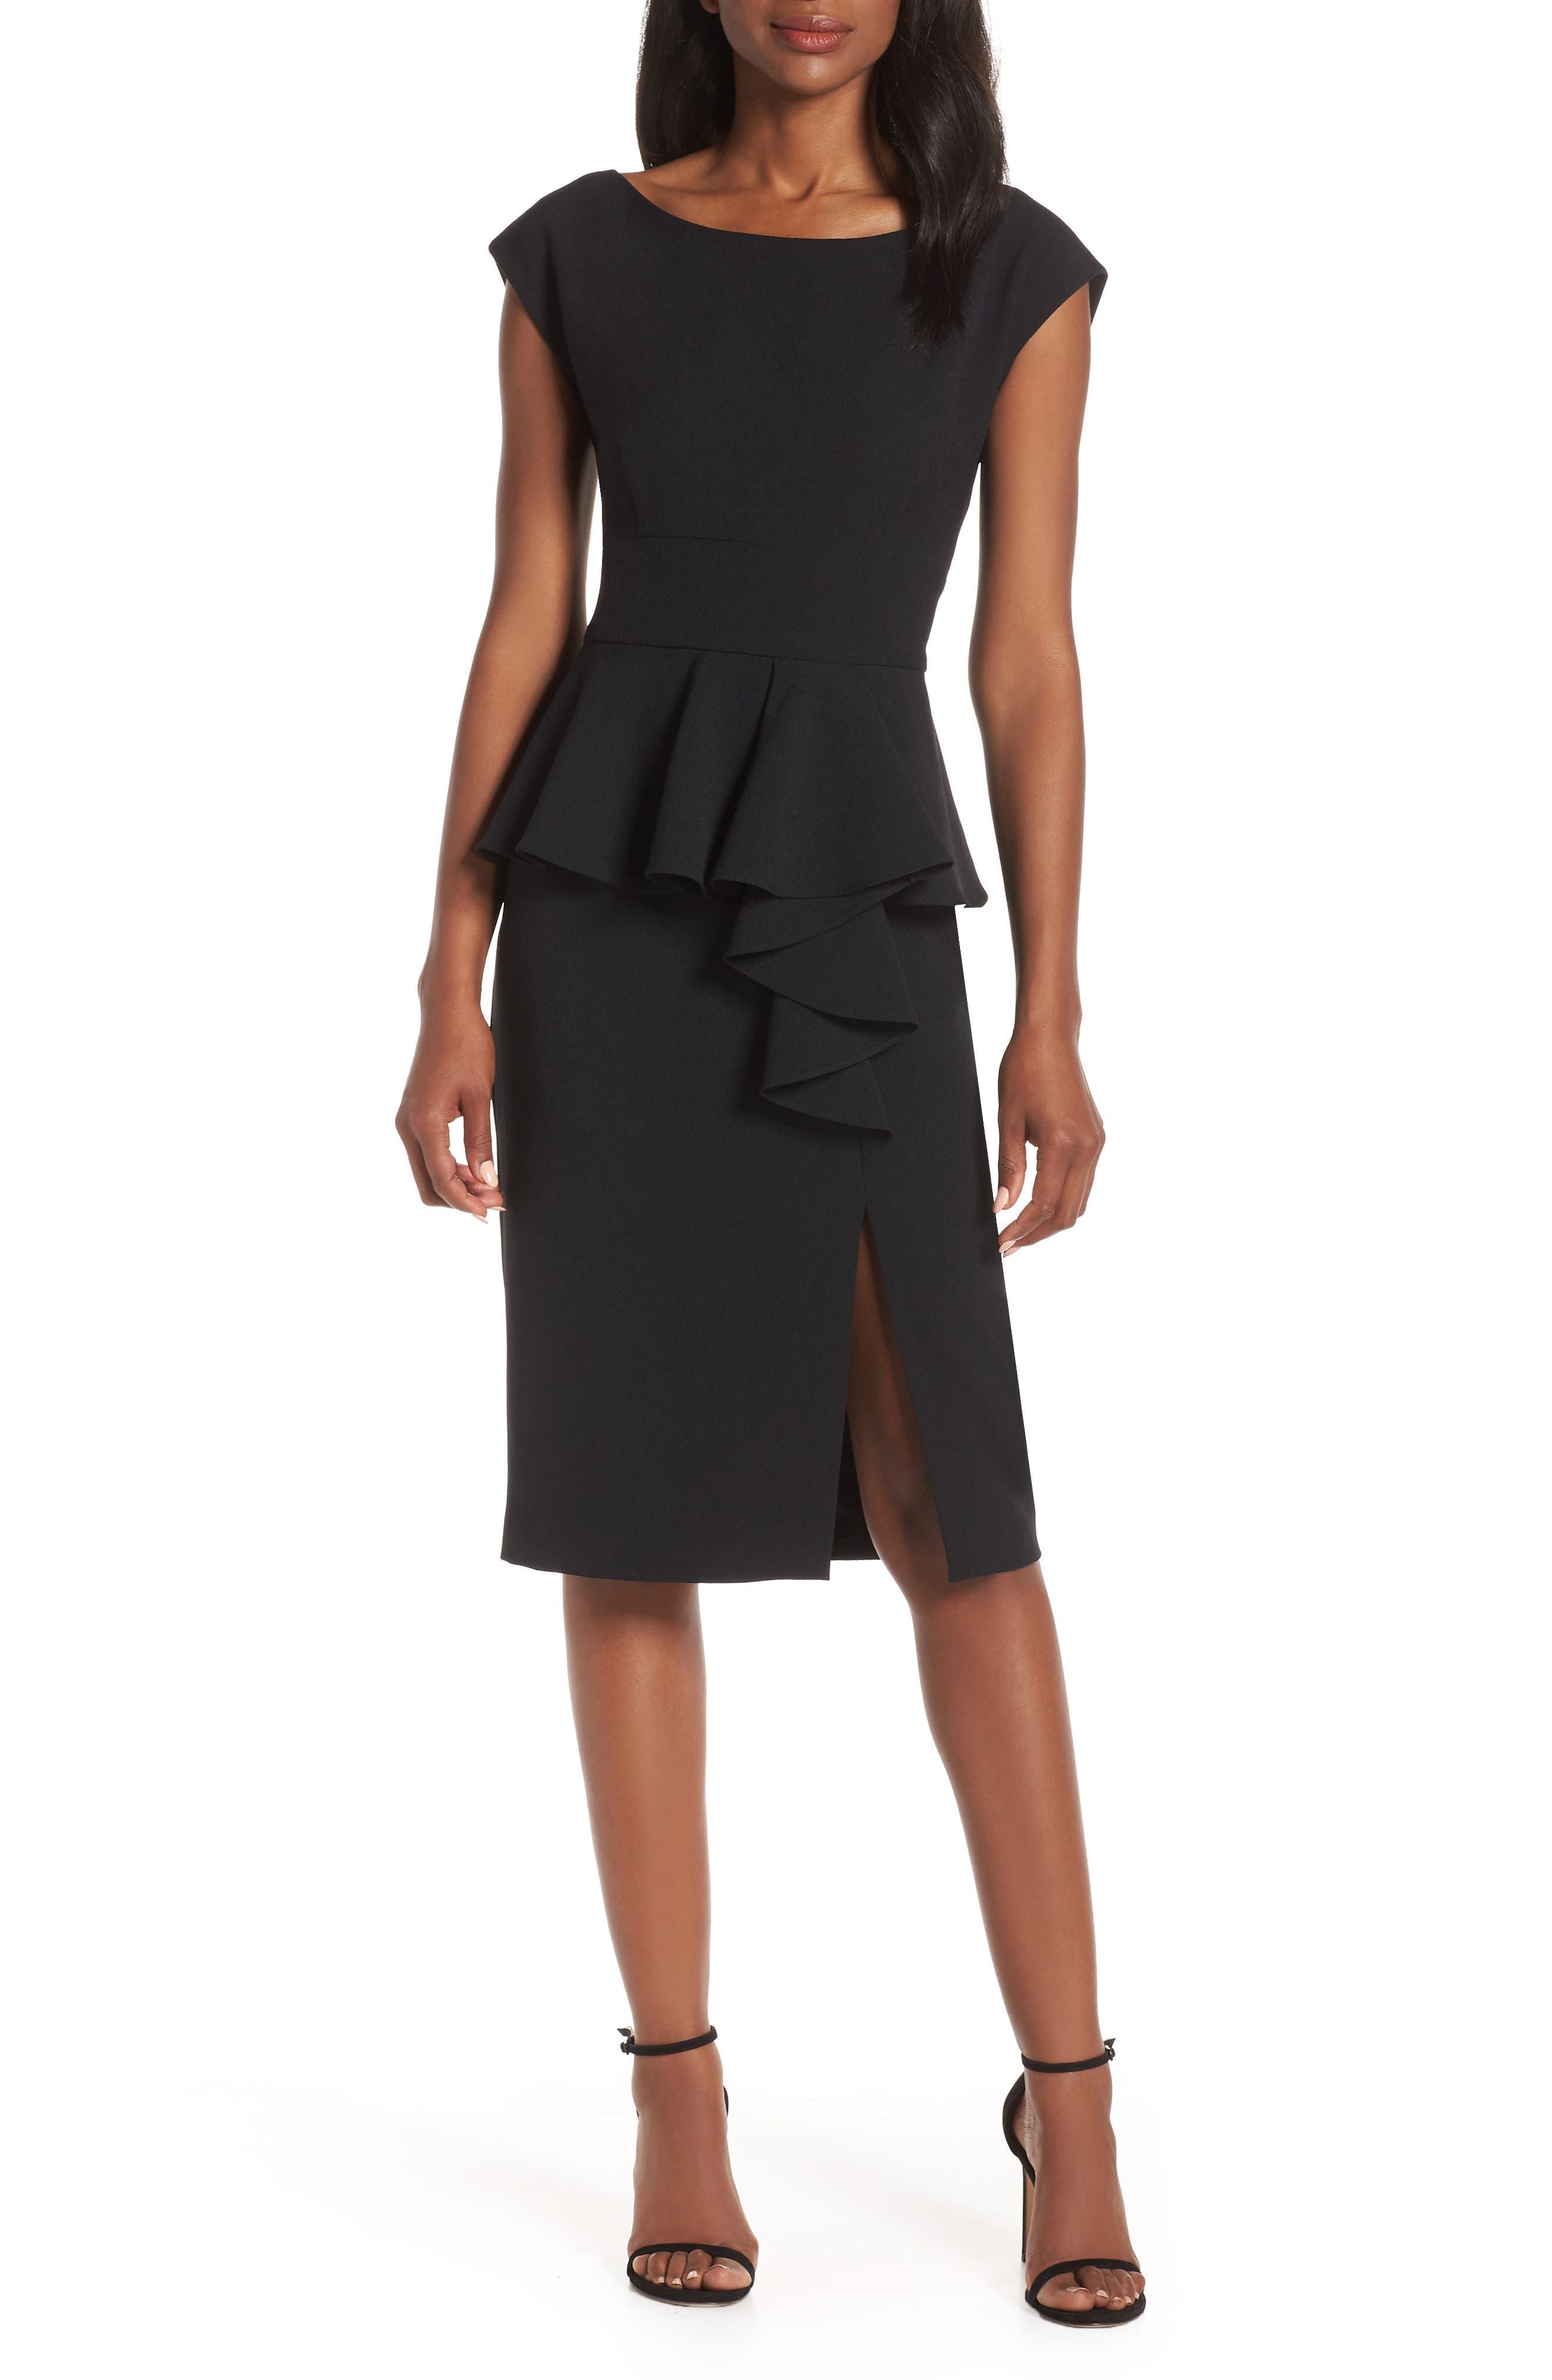 Harper Rose Peplum Sheath Dress